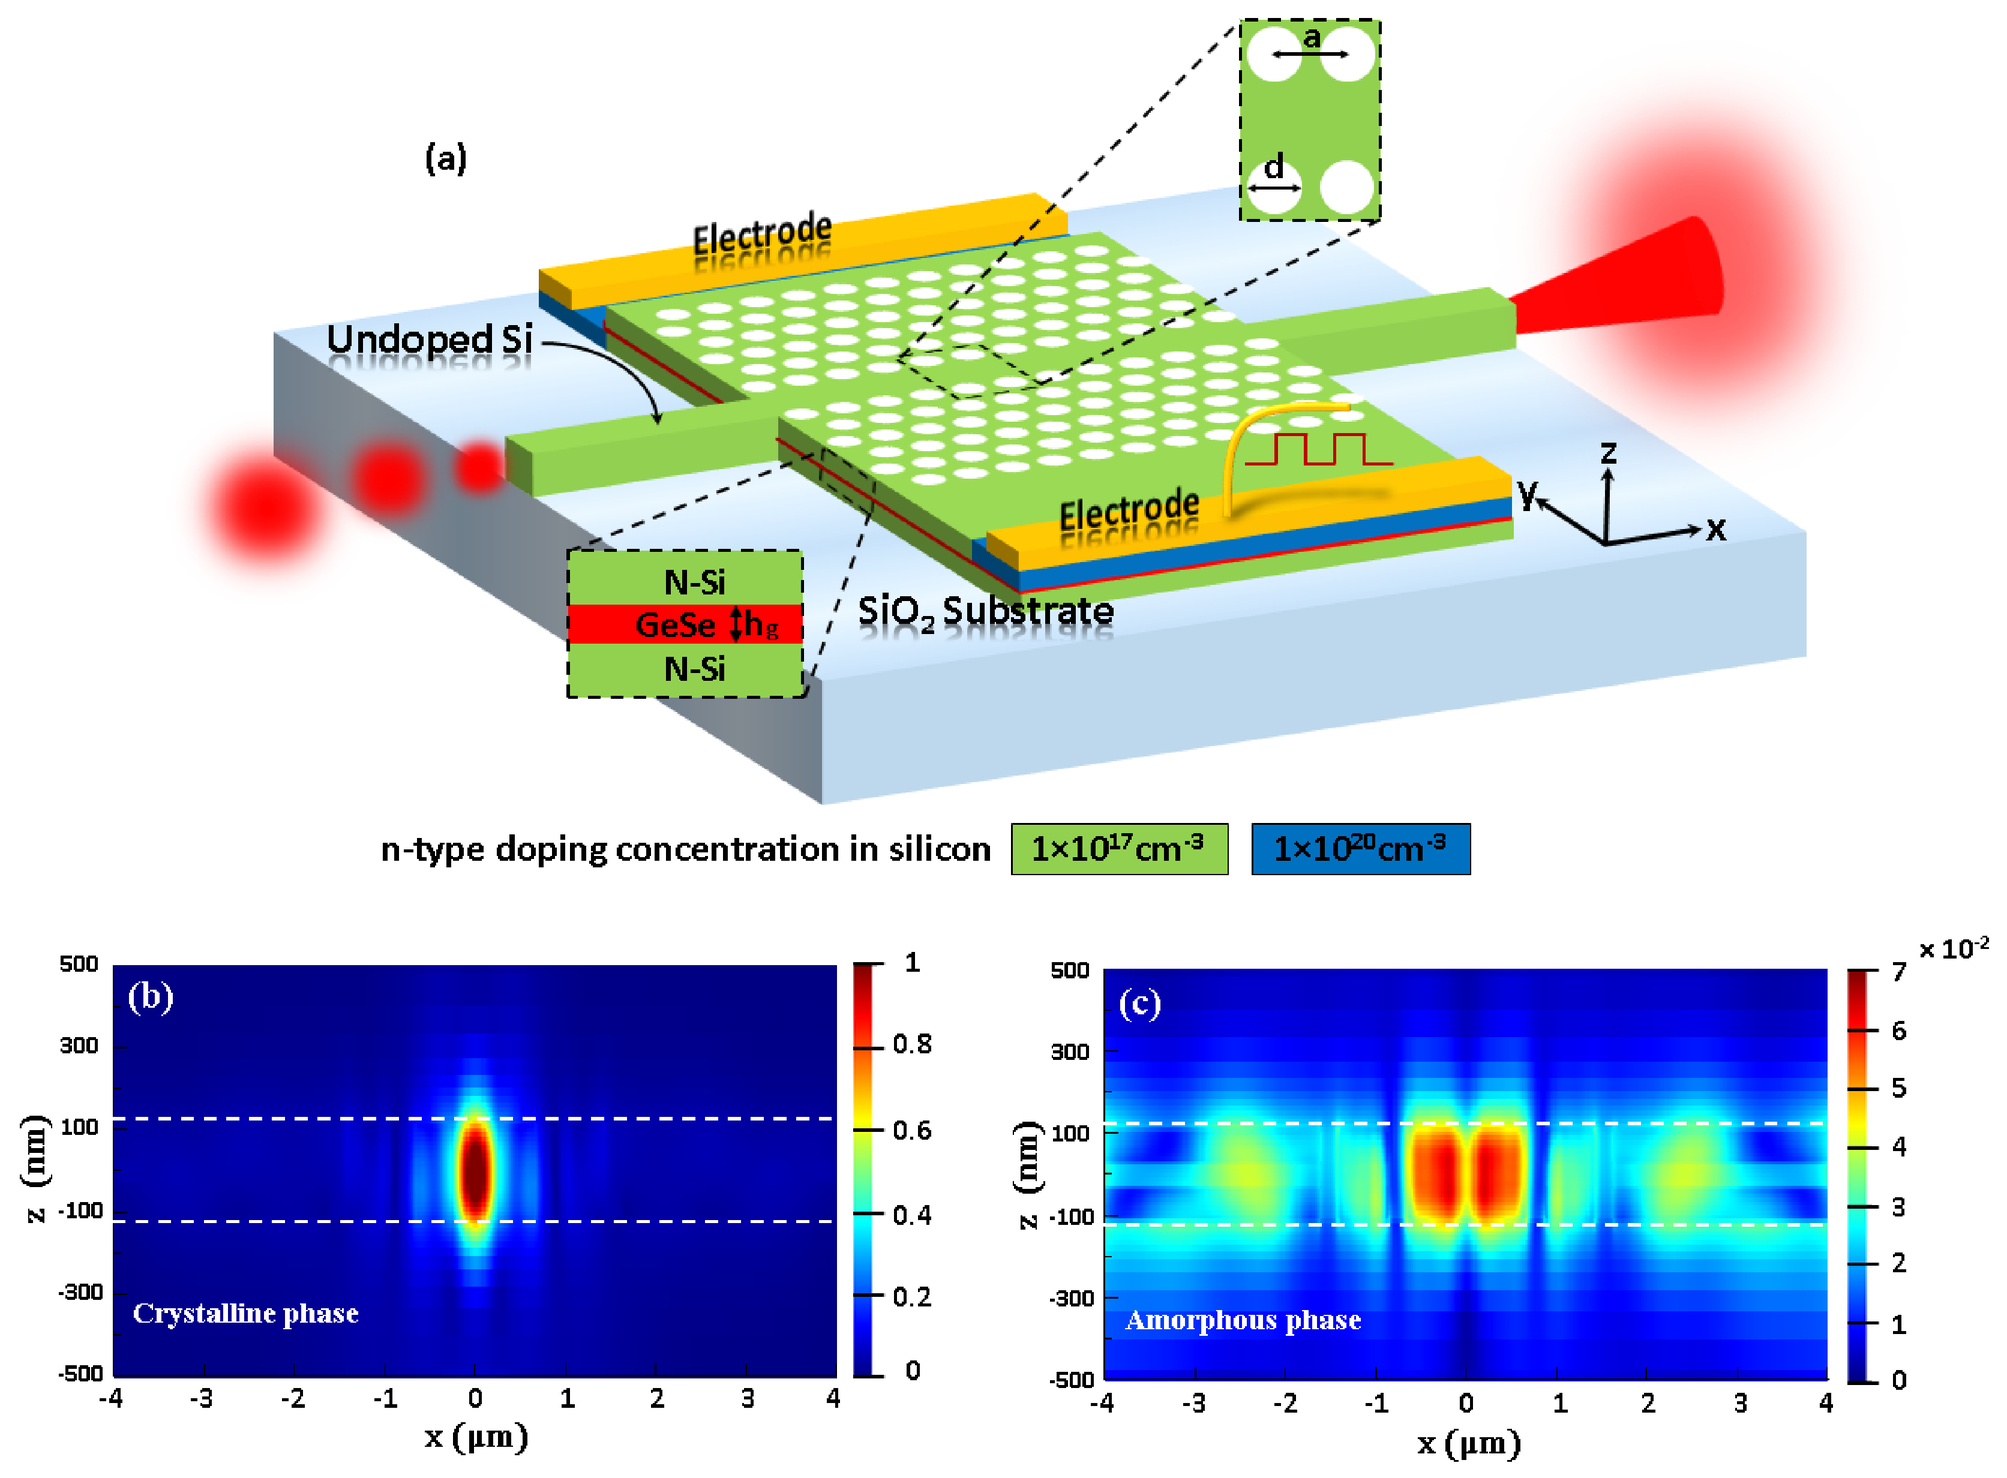 broadband electro optic modulator based on a phase change material00632_psisdg10923_109231v_page_2_1 jpg